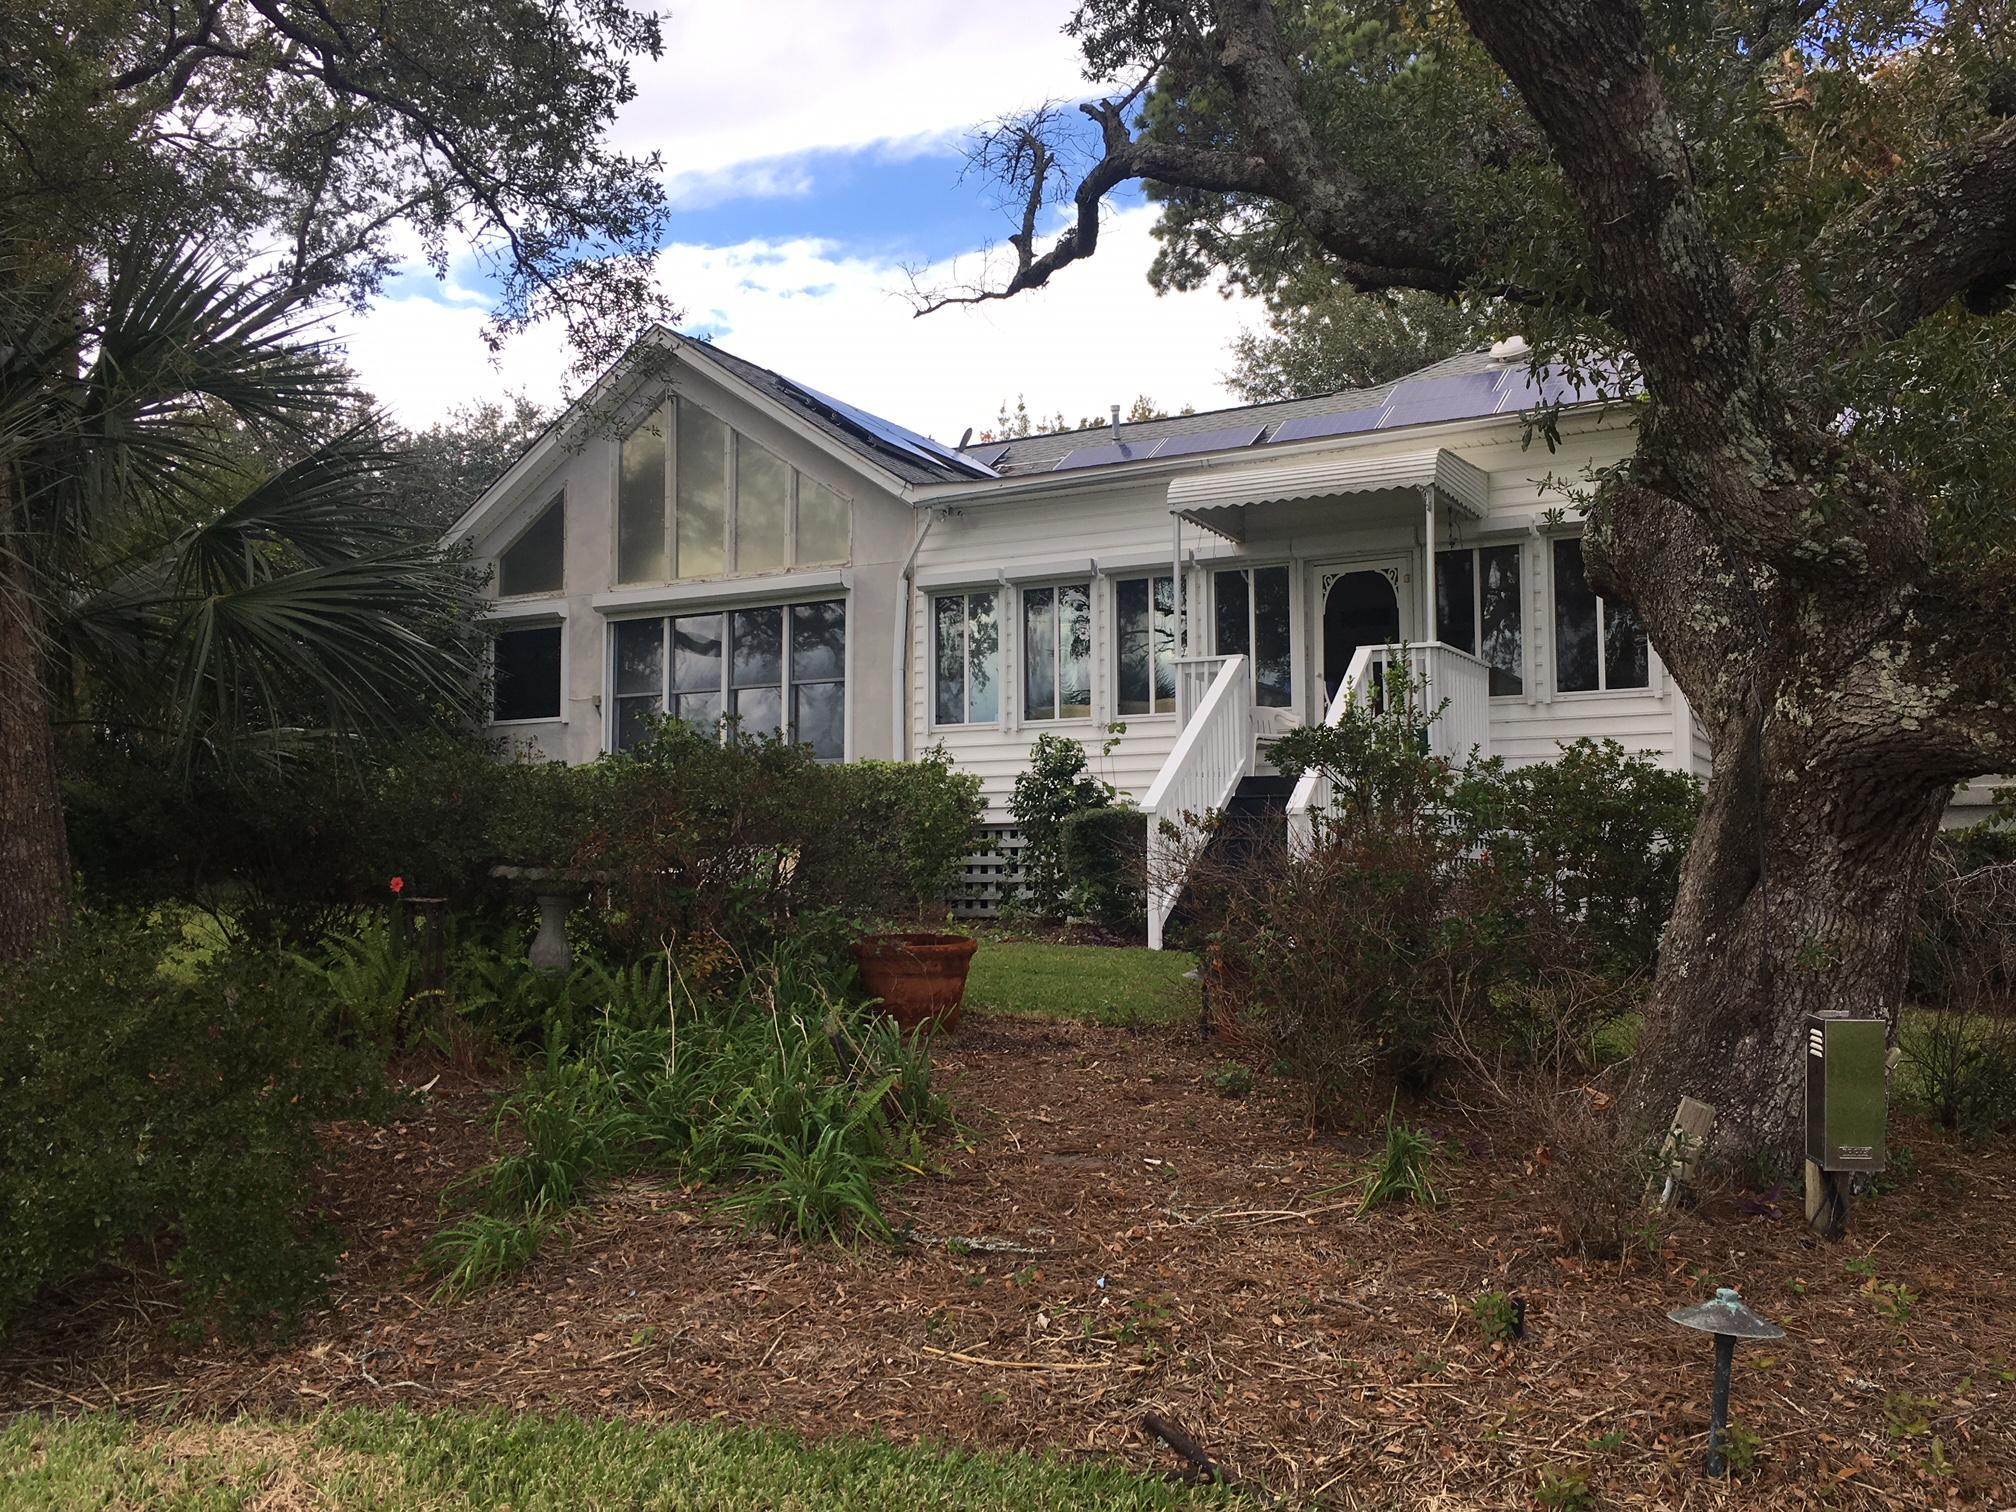 Photo of 12 Trachelle Ln, Charleston, SC 29407